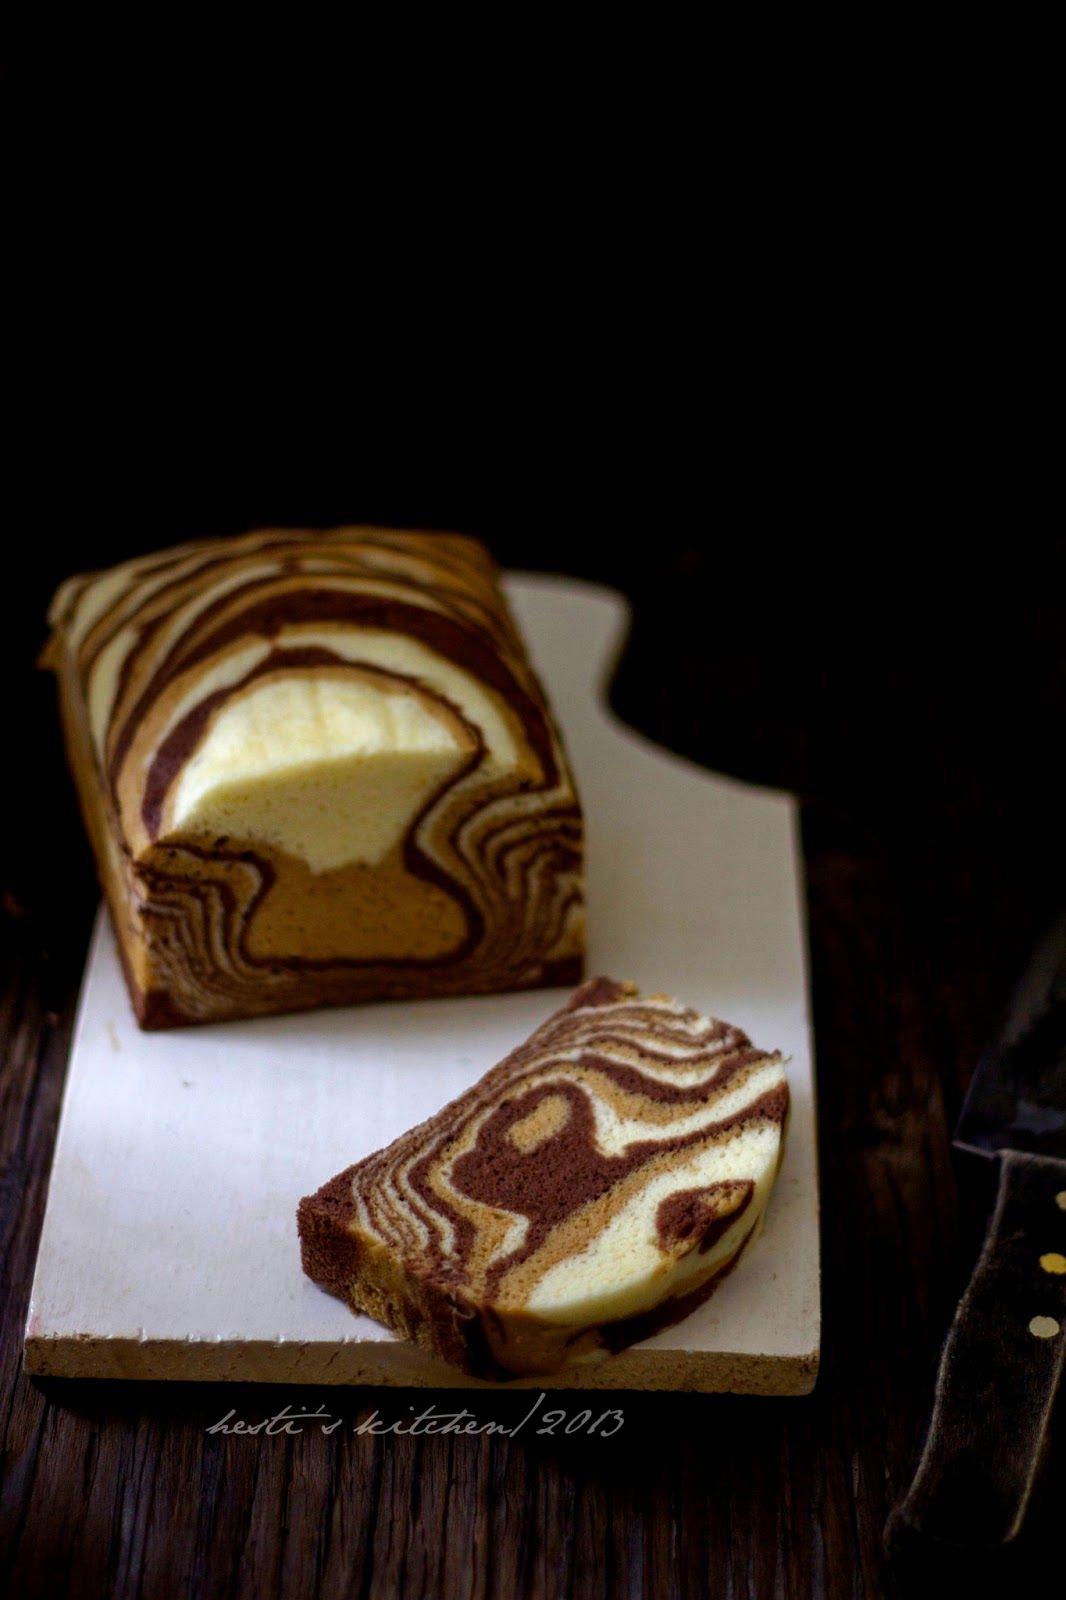 Hesti S Kitchen Yummy For Your Tummy Zebra Kukus Putih Telur Zebra Cake Cake Recipes Steamed Cake